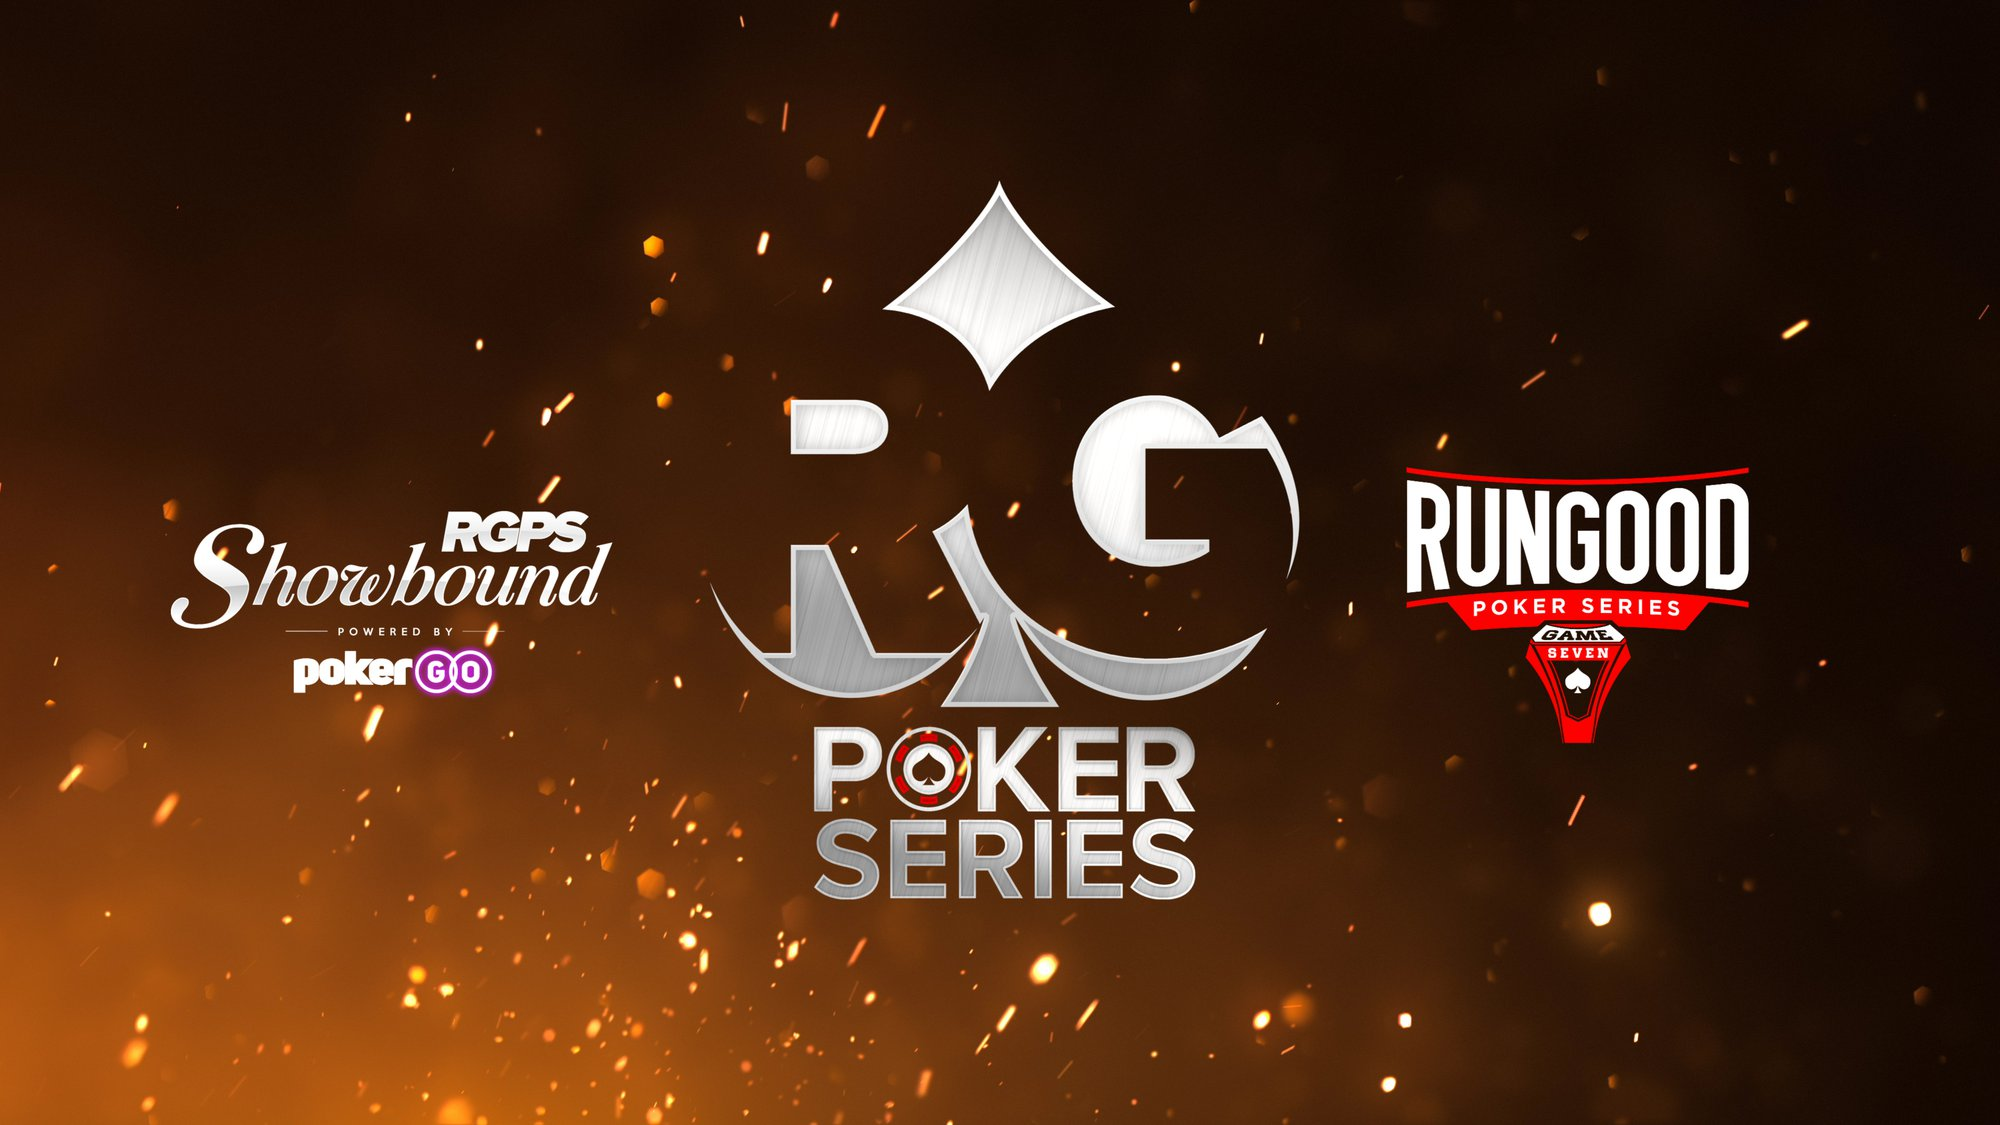 RunGood Poker Series Heads to Iowa This Week